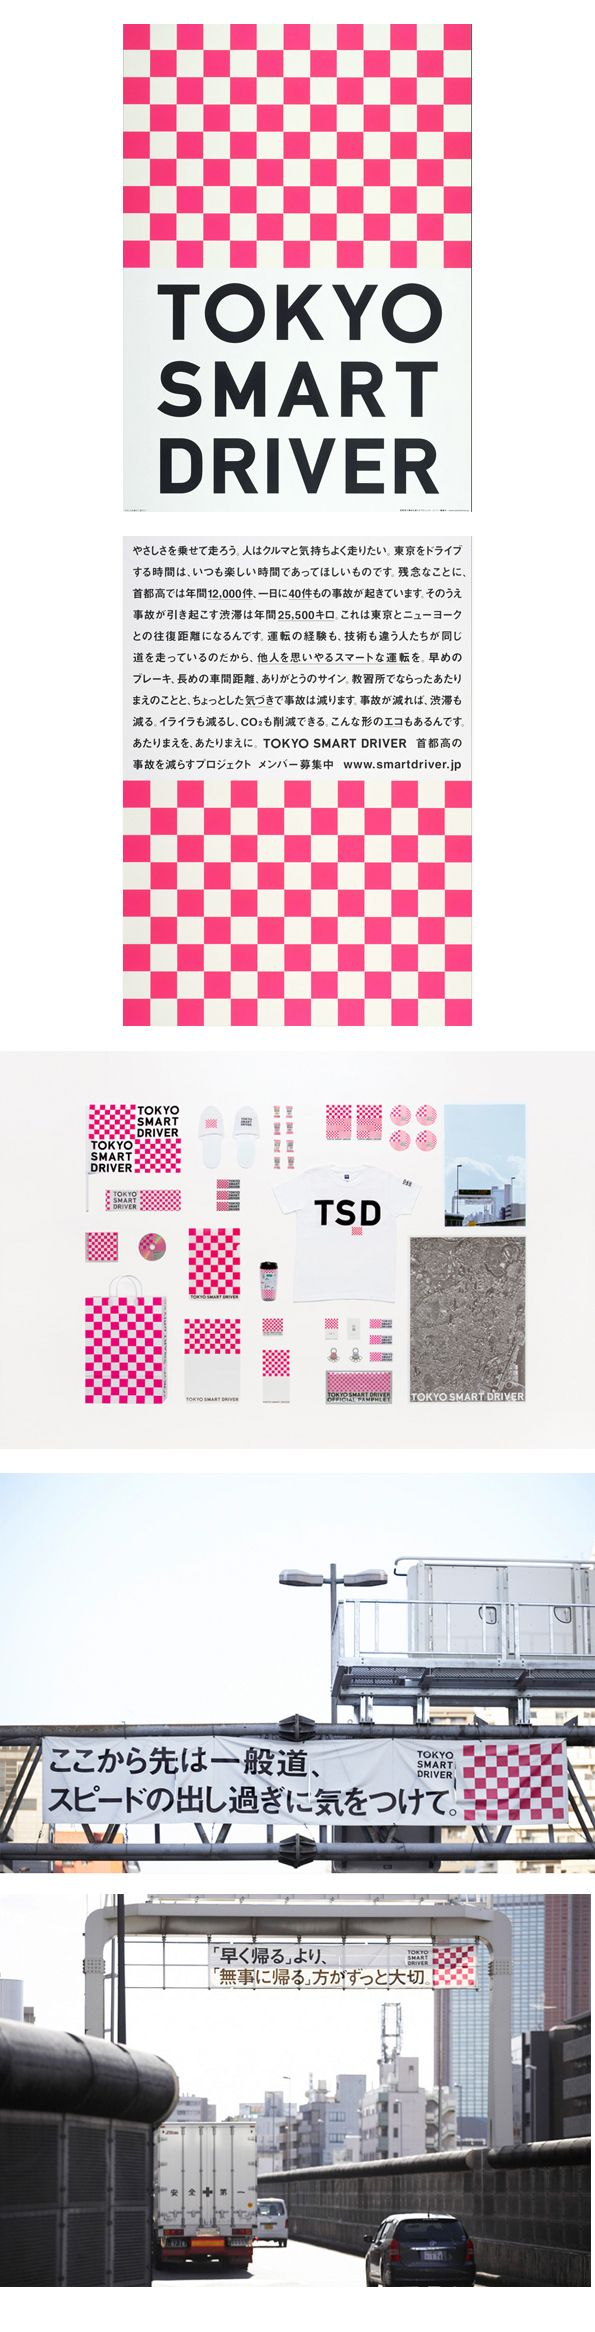 good design company | 東京スマートドライバー